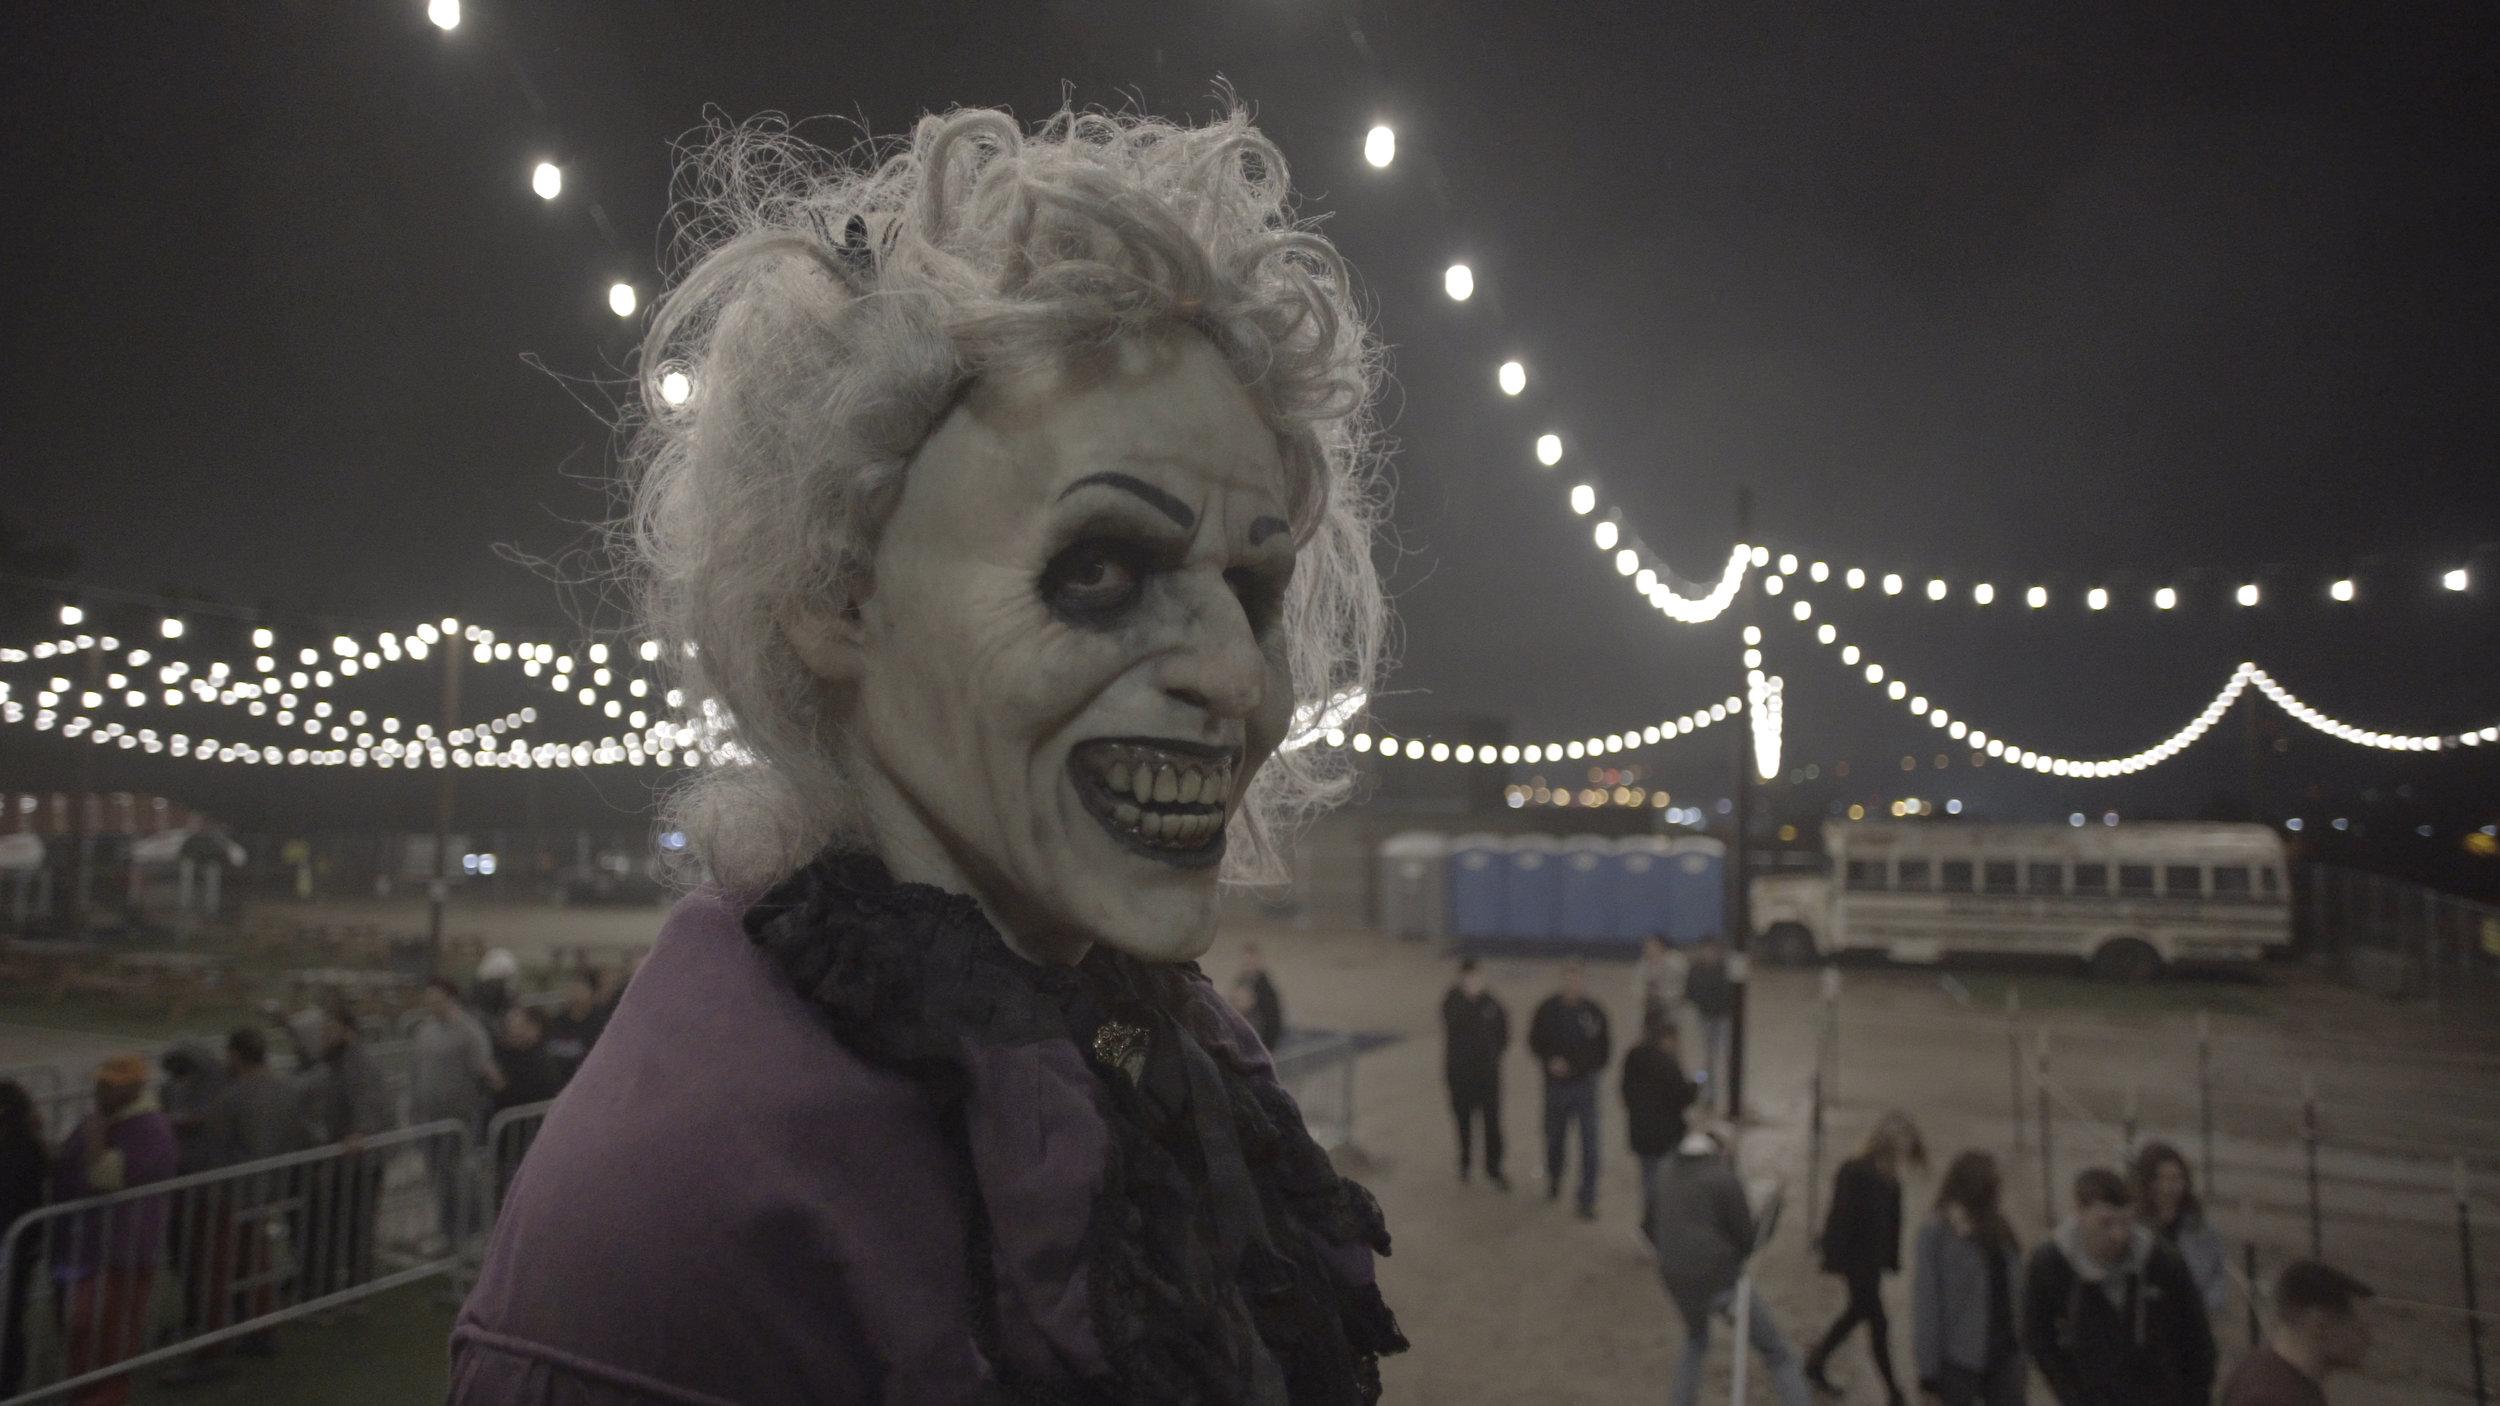 MRDRBL_Halloween.jpg